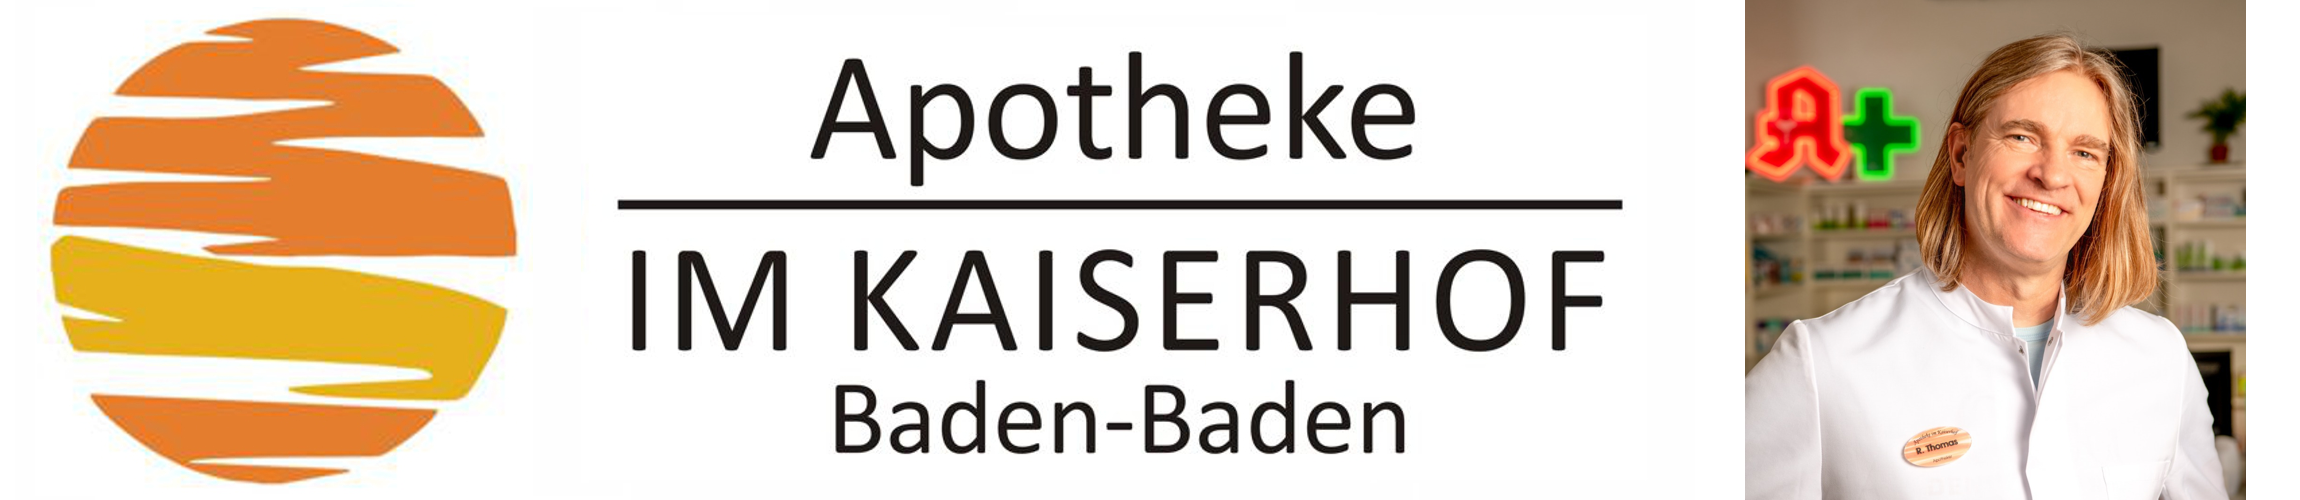 Logo der Apotheke im Kaiserhof